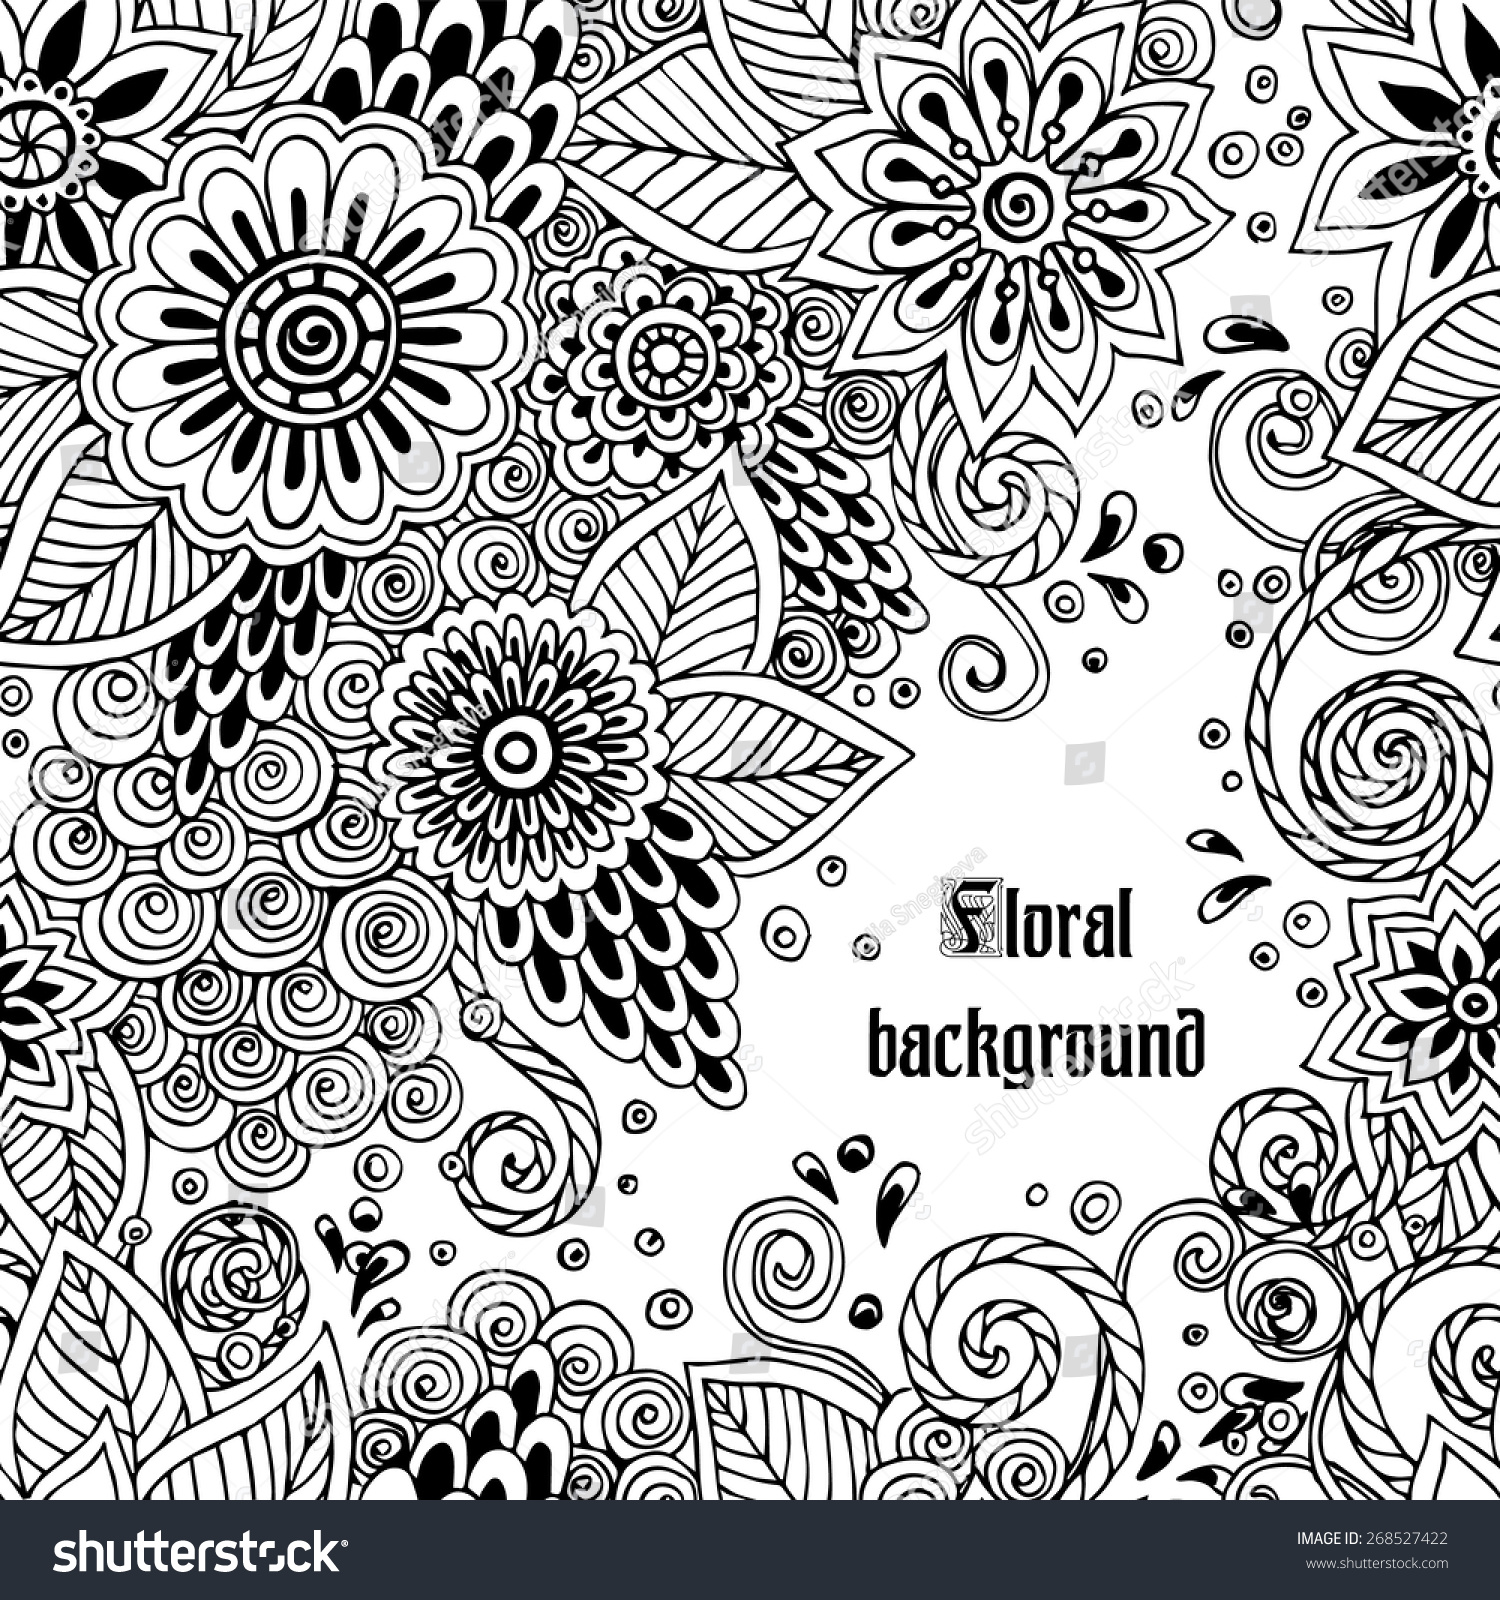 Ornate Floral Pattern Flowersdoodle Sharpie Floral Stock Vector 1500x1600